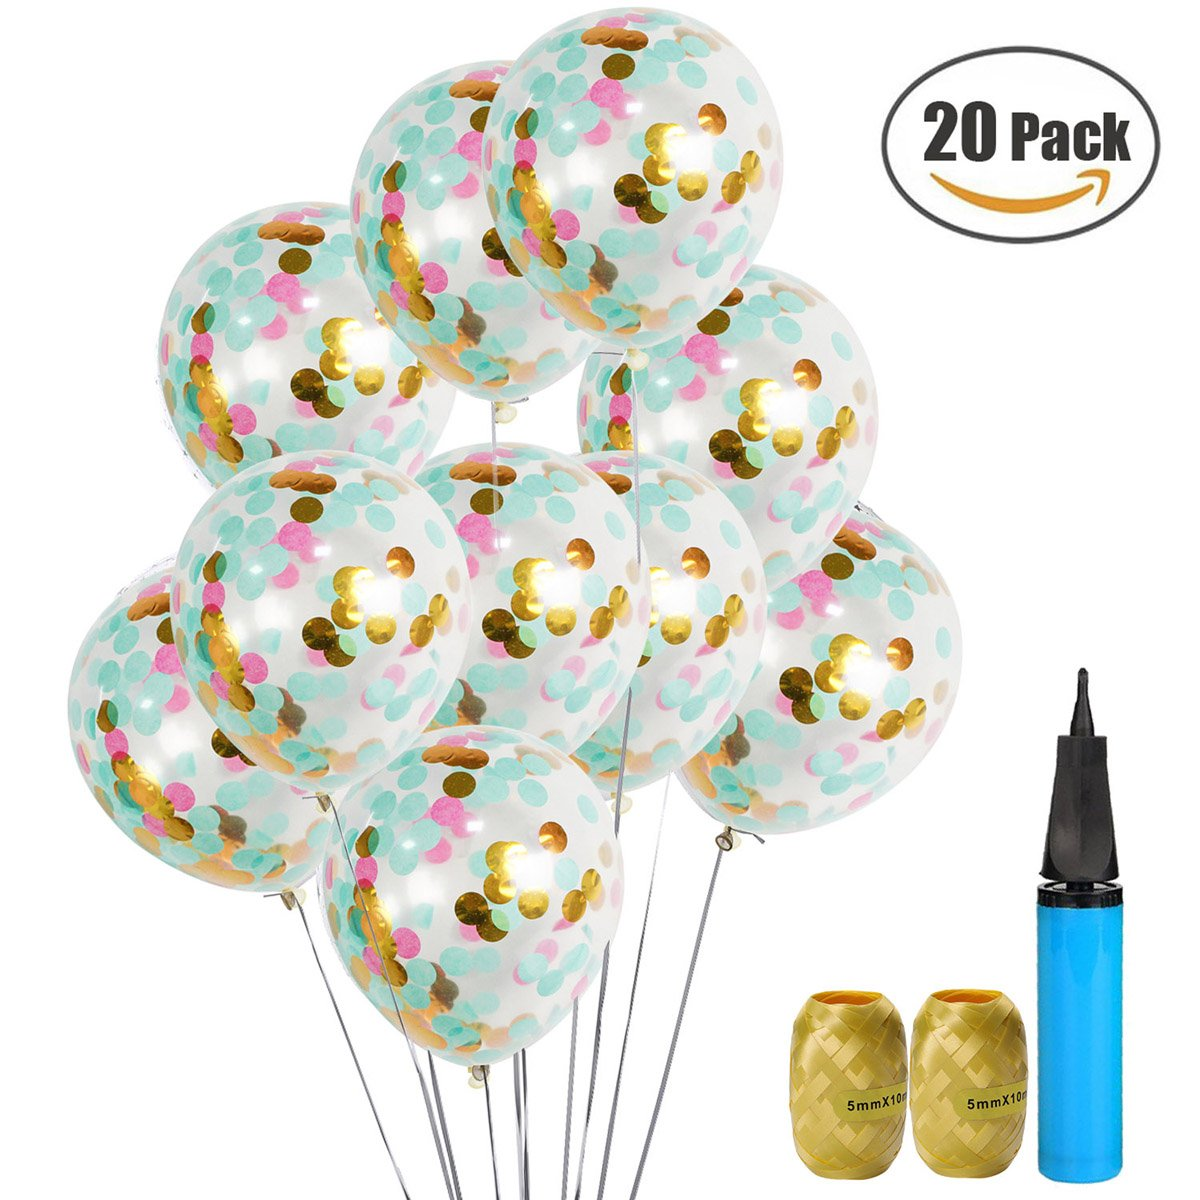 Amazon.com: UTOPP 20 Pack Confetti Balloons Tiffany Blue Pink and ...